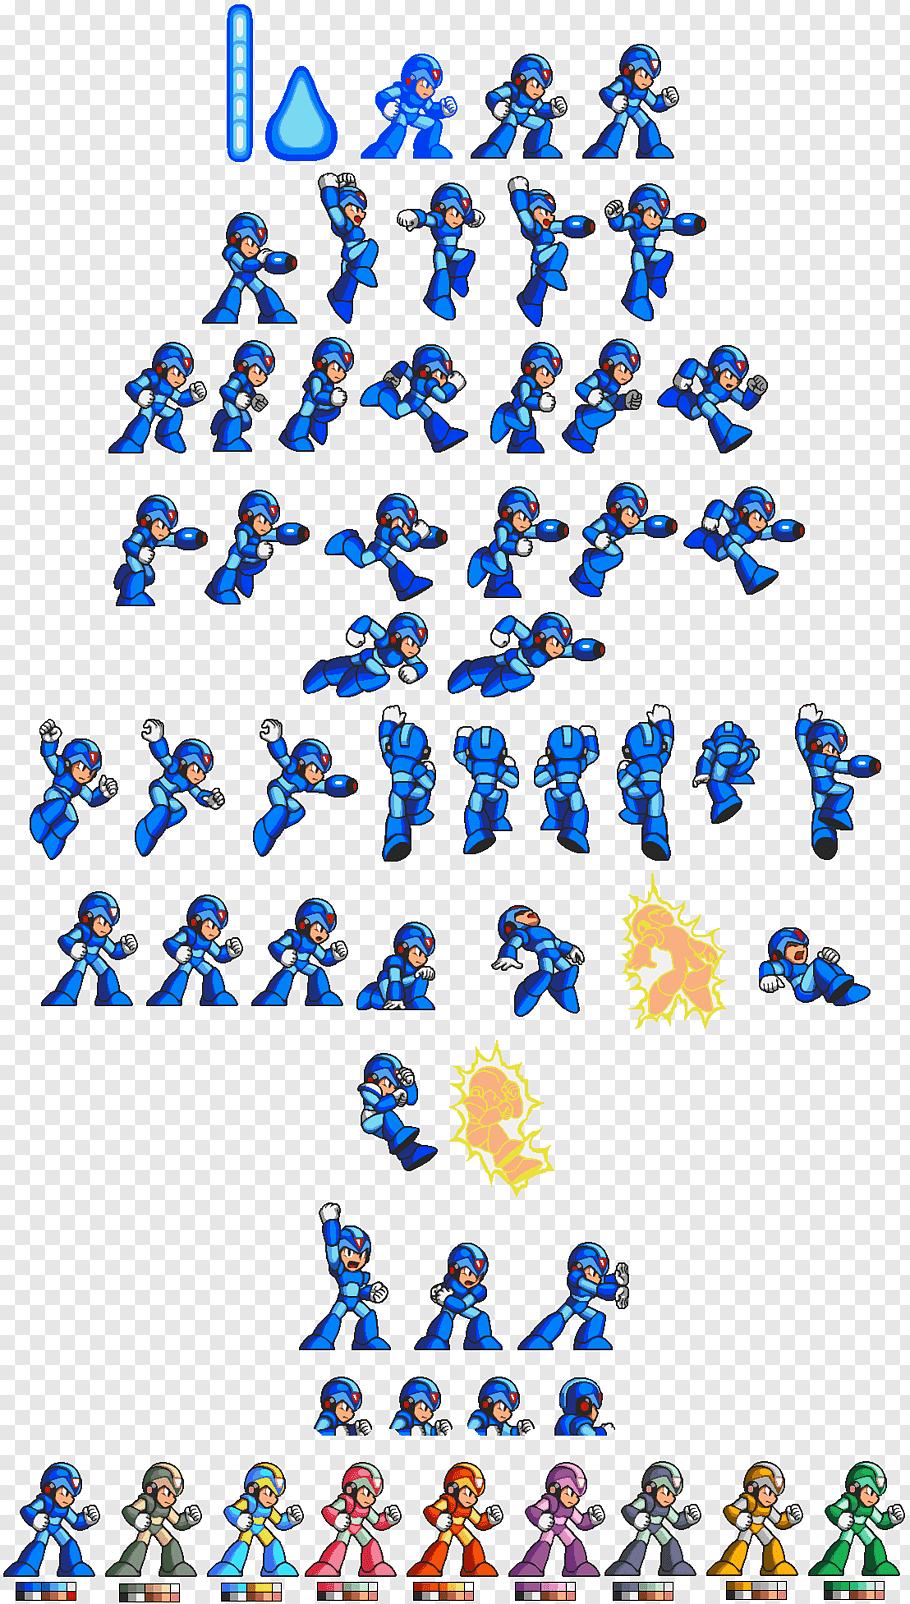 Megaman Illustration Mega Man X Sprite Pixel Art Characters Pixel Art Game Character Design